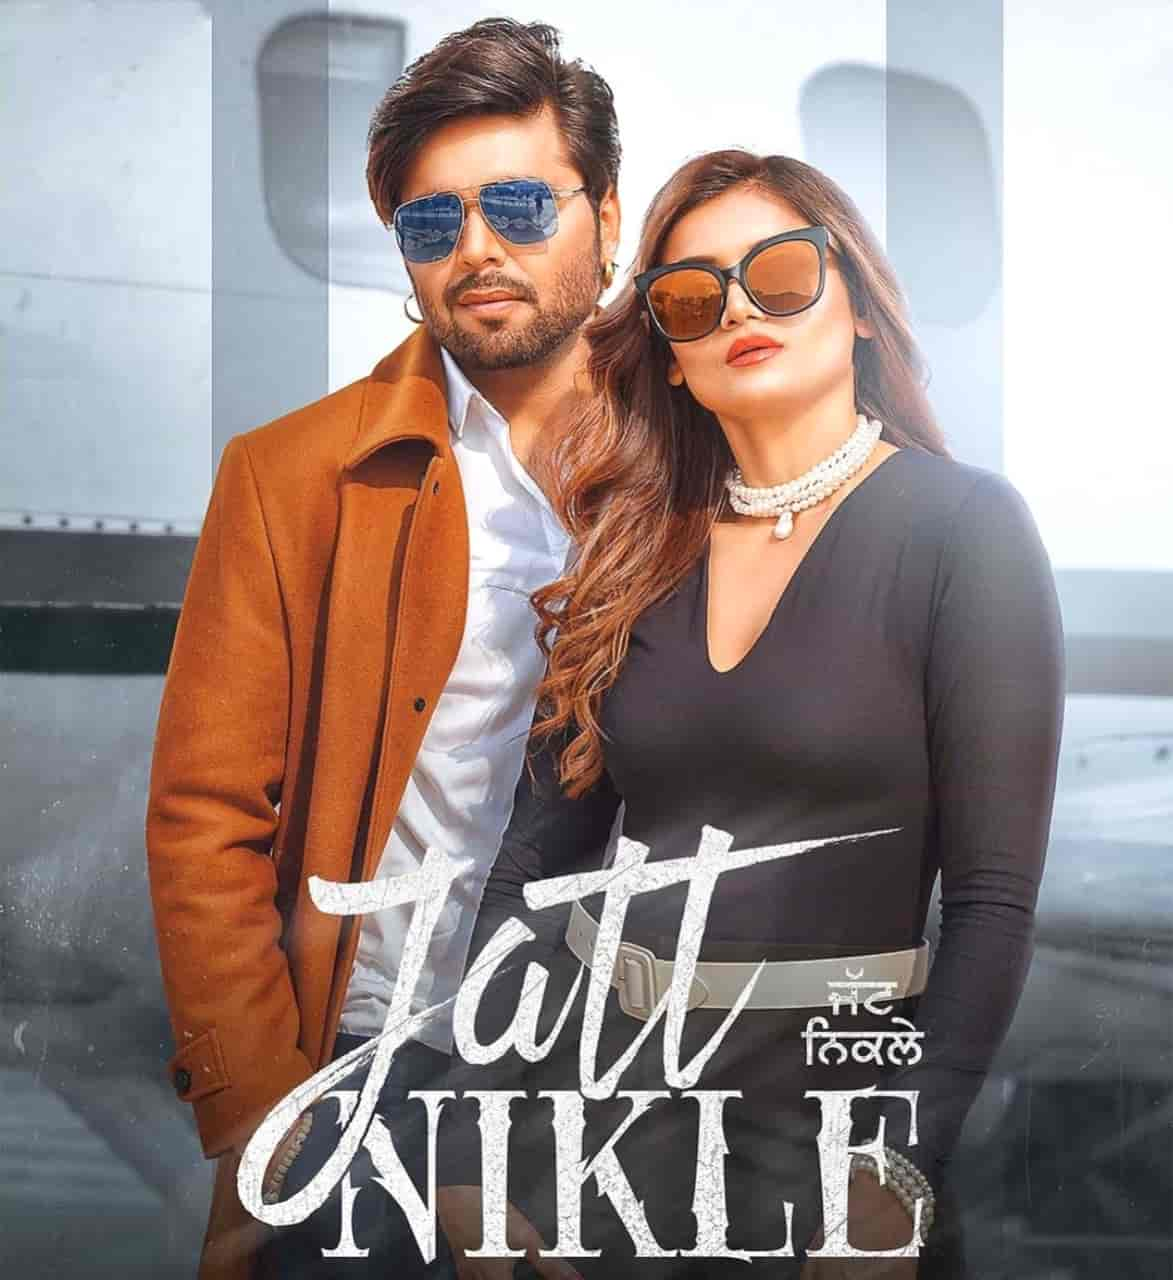 Jatt Nikle Punjabi Song Lyrics Ninja and Shipra Goyal